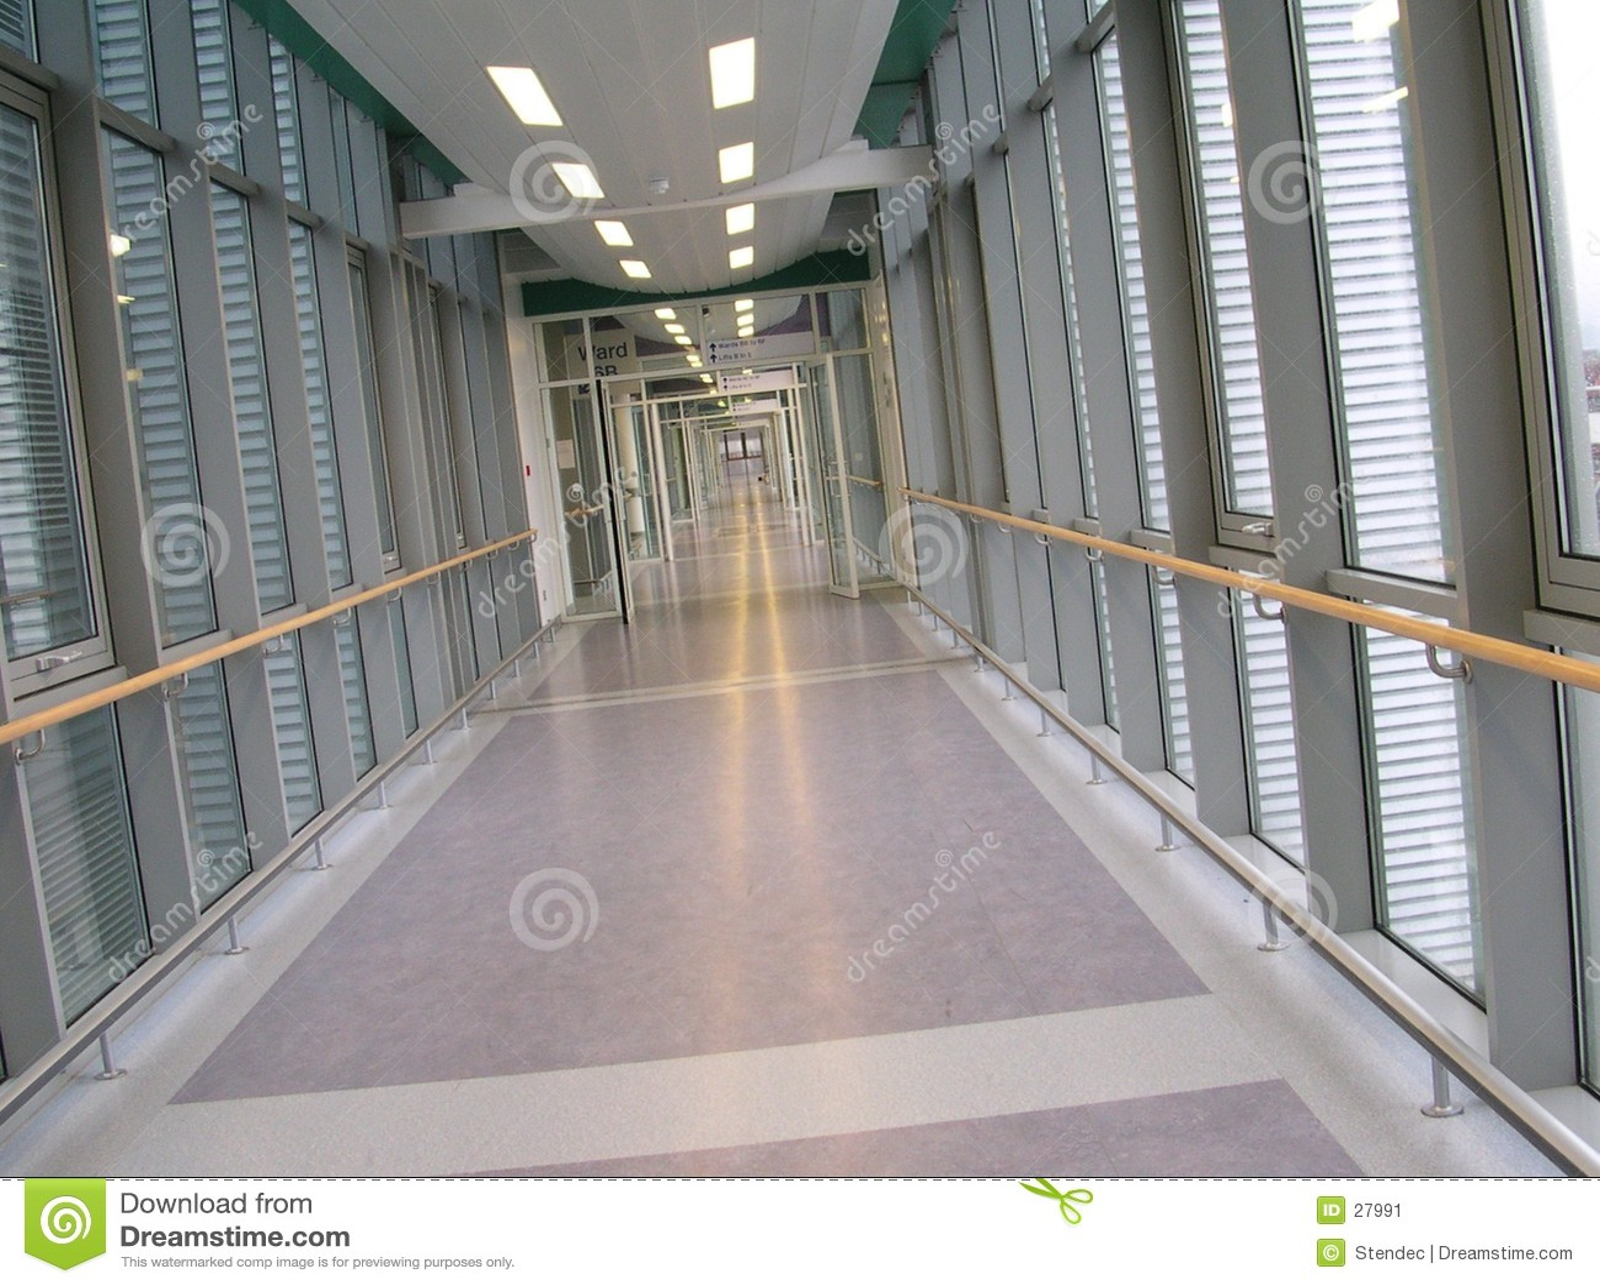 Empty corridor in a hospital